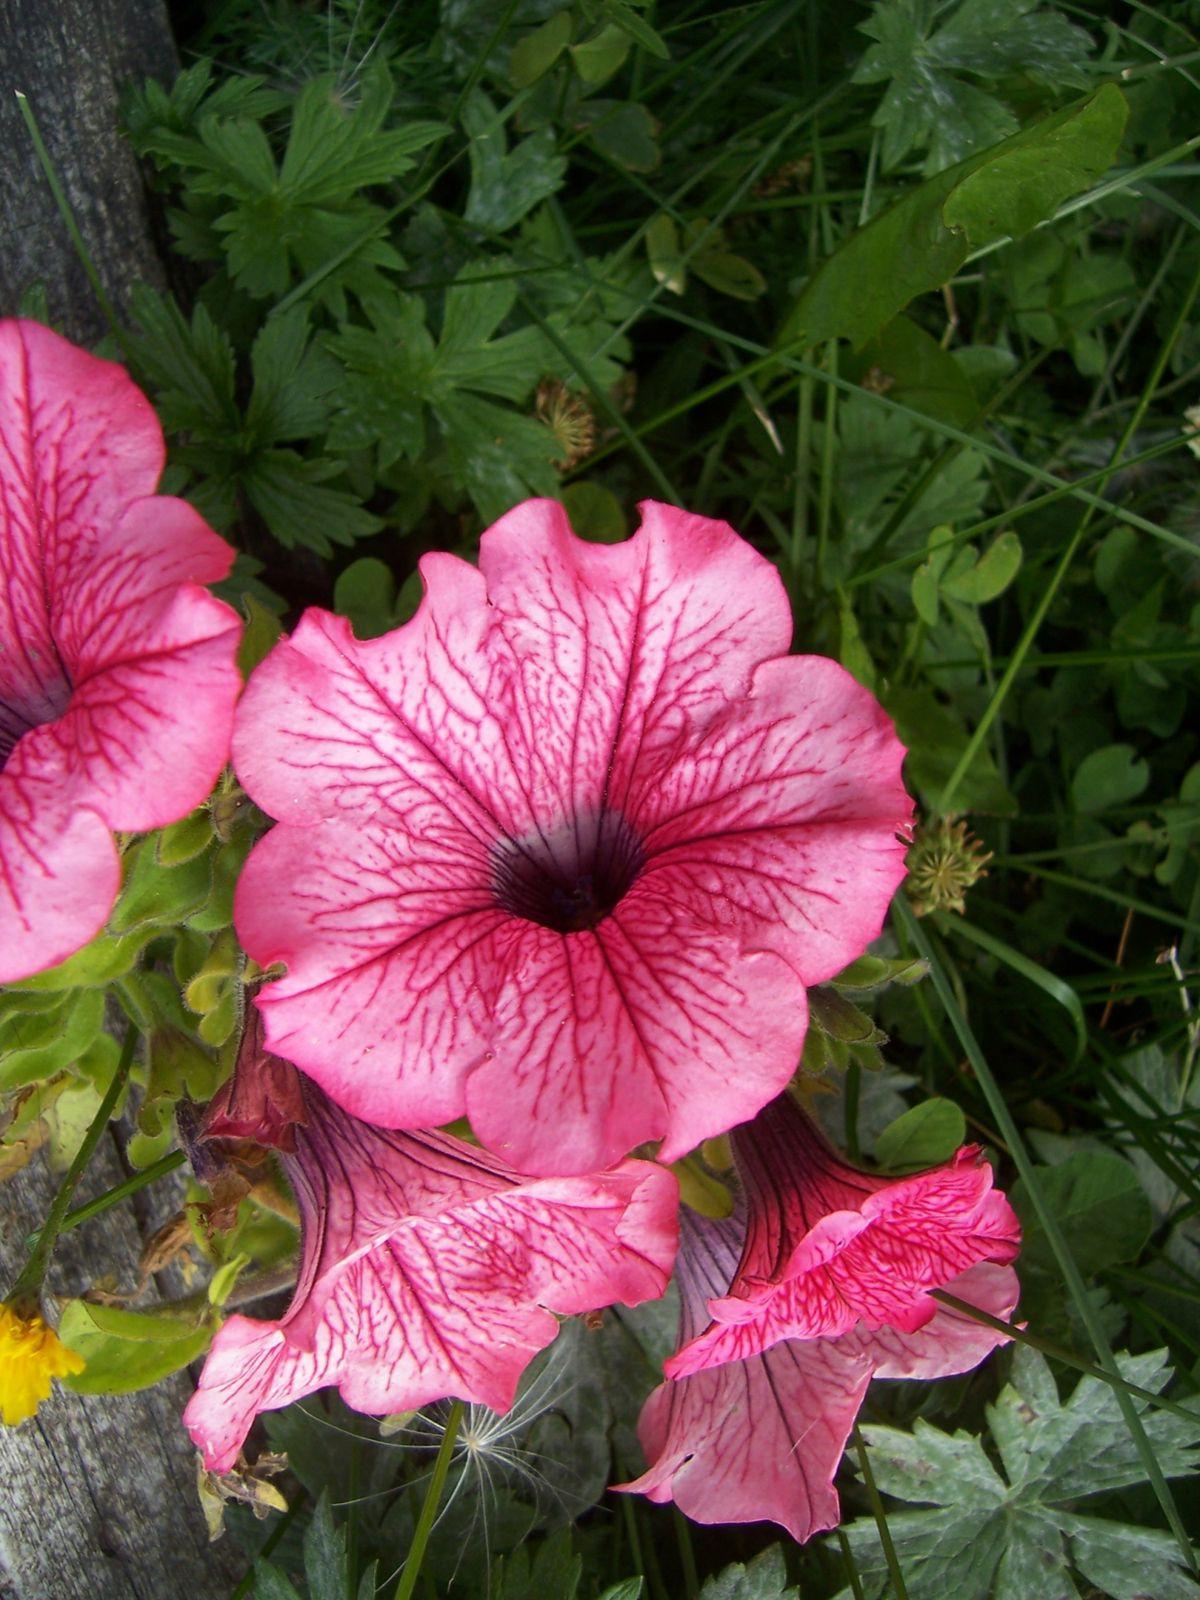 Photo de fleur : fleur de petunia rose